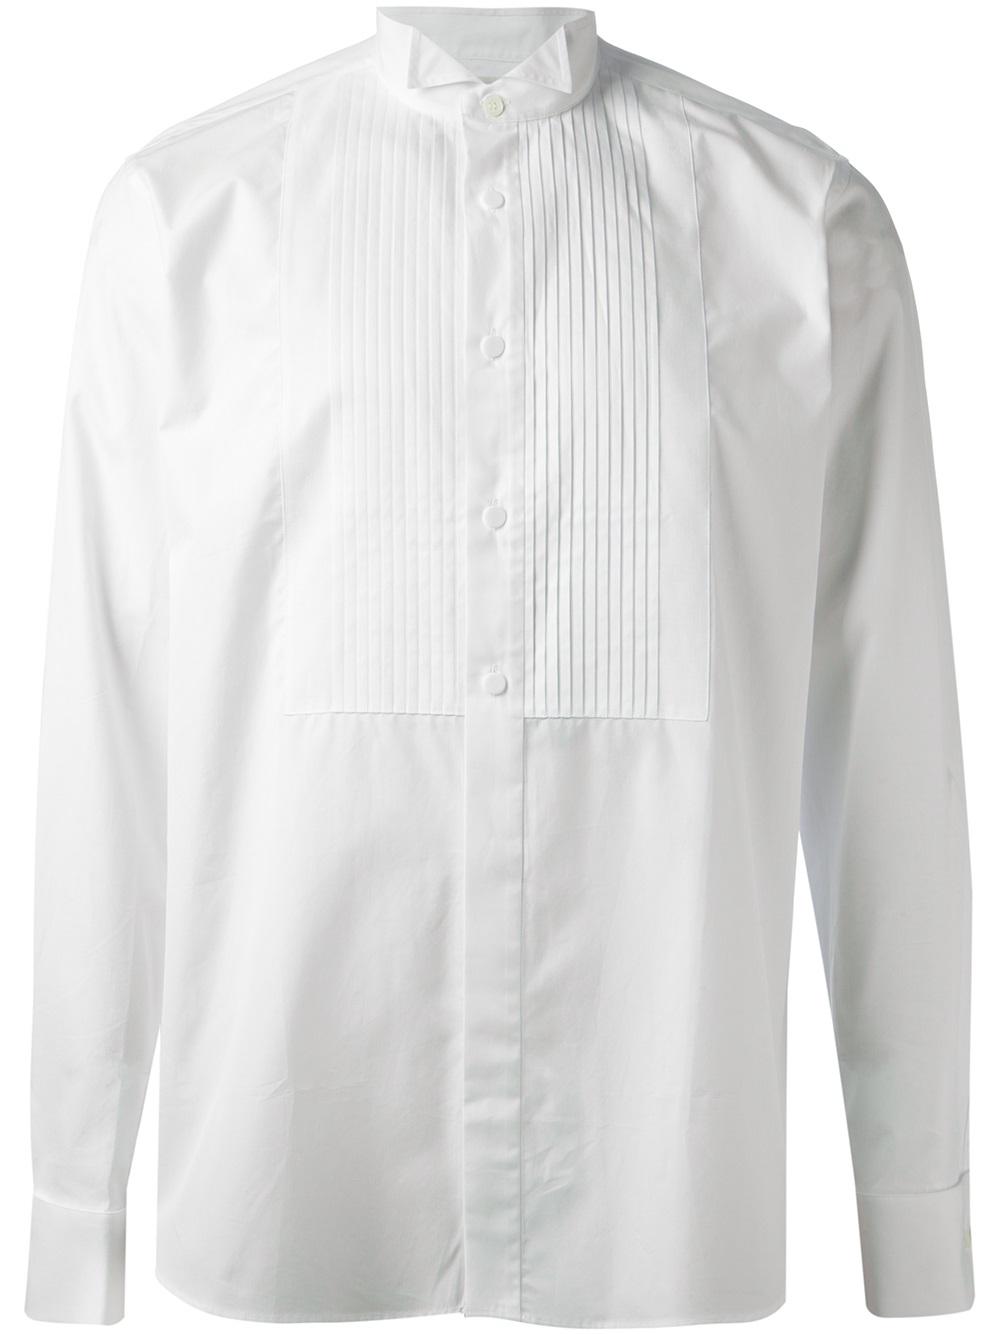 684eade6d3d998 Saint Laurent Pleated Front Bib Shirt in White for Men - Lyst